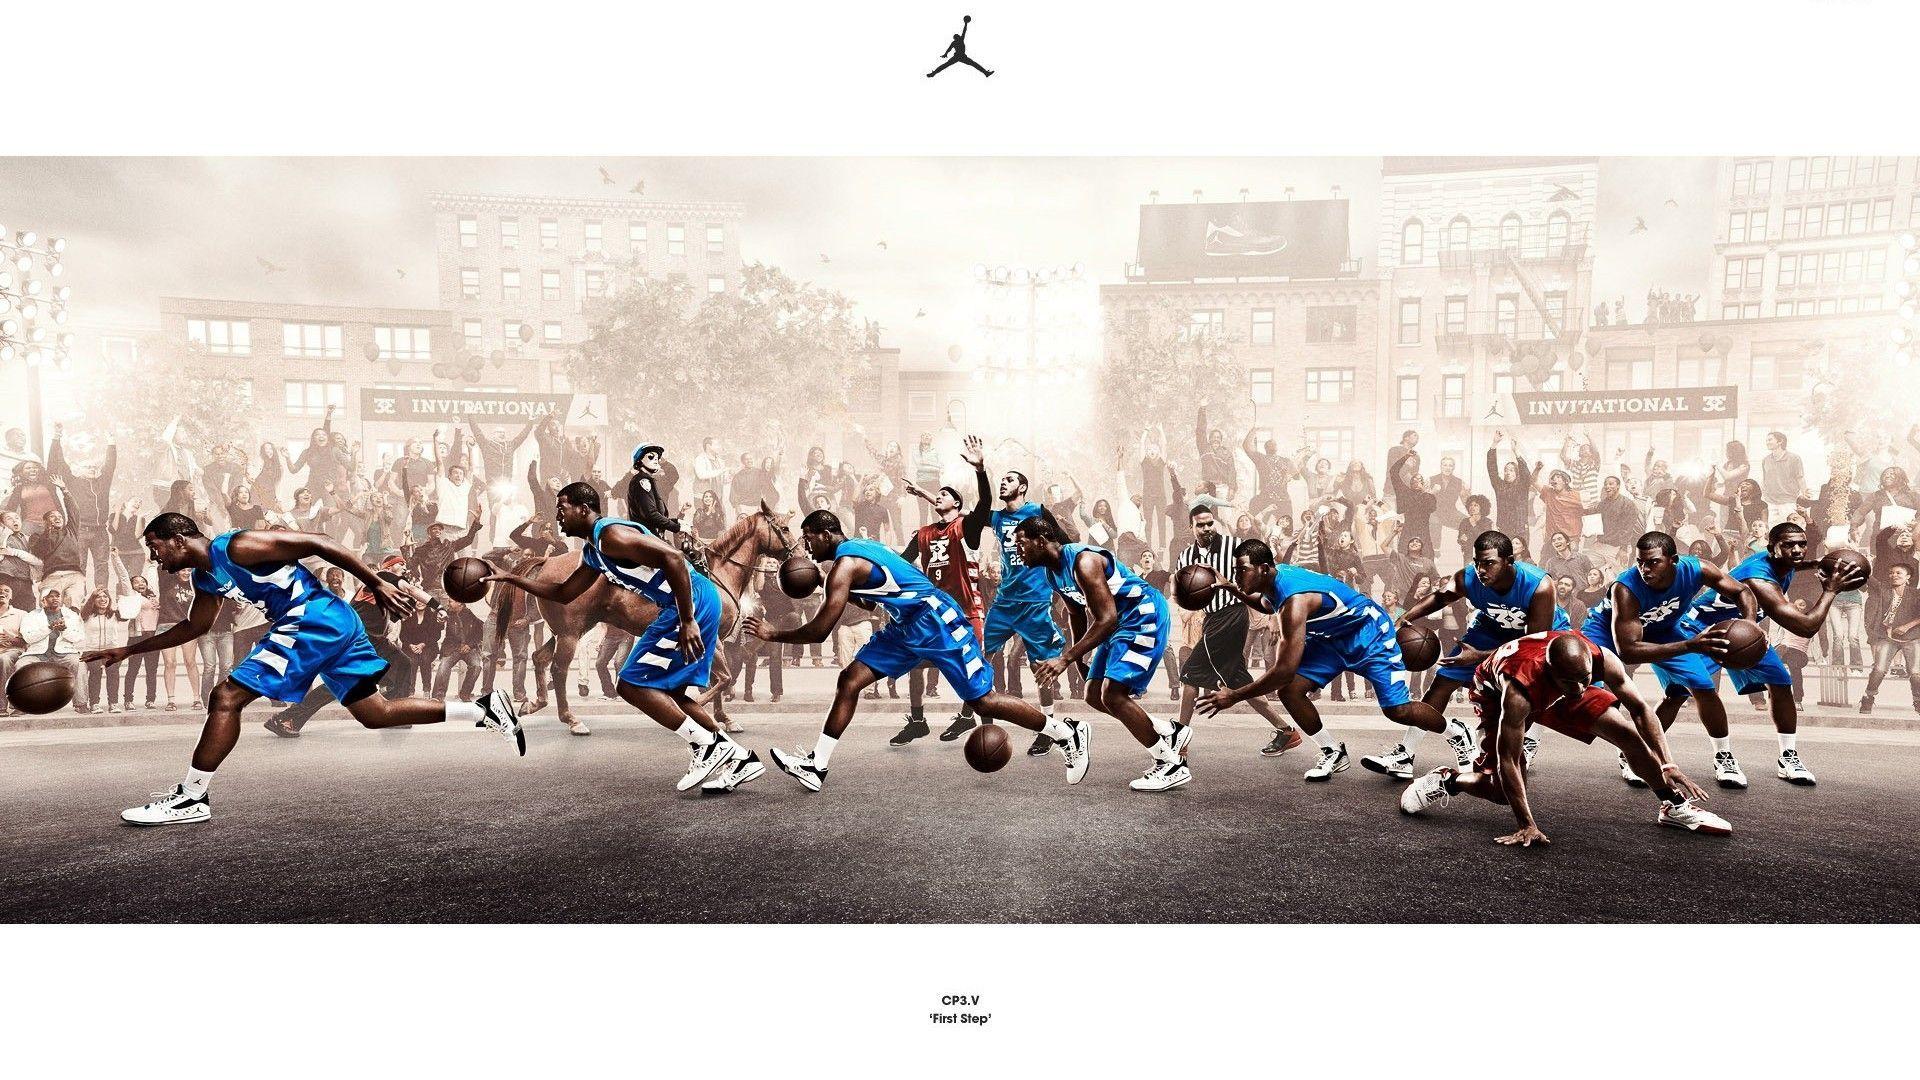 jordan shoes basketball player 1920x1080 hd wallpaper and free